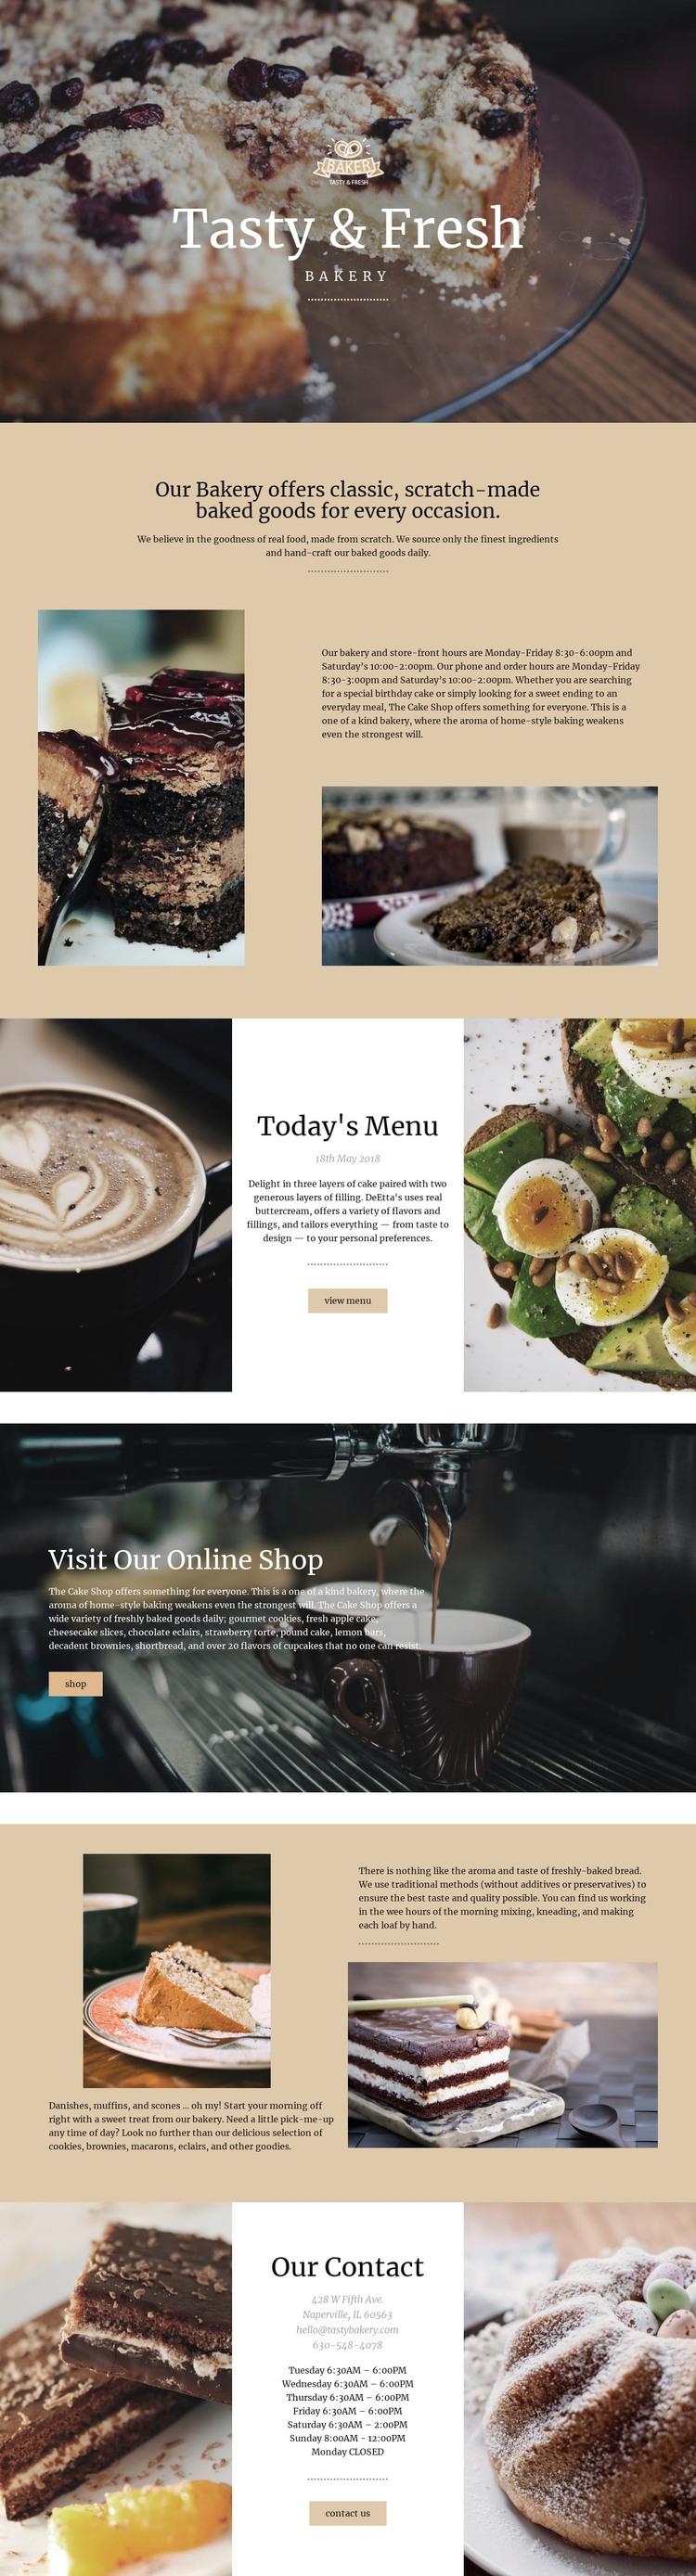 Tasty and fresh food WordPress Theme